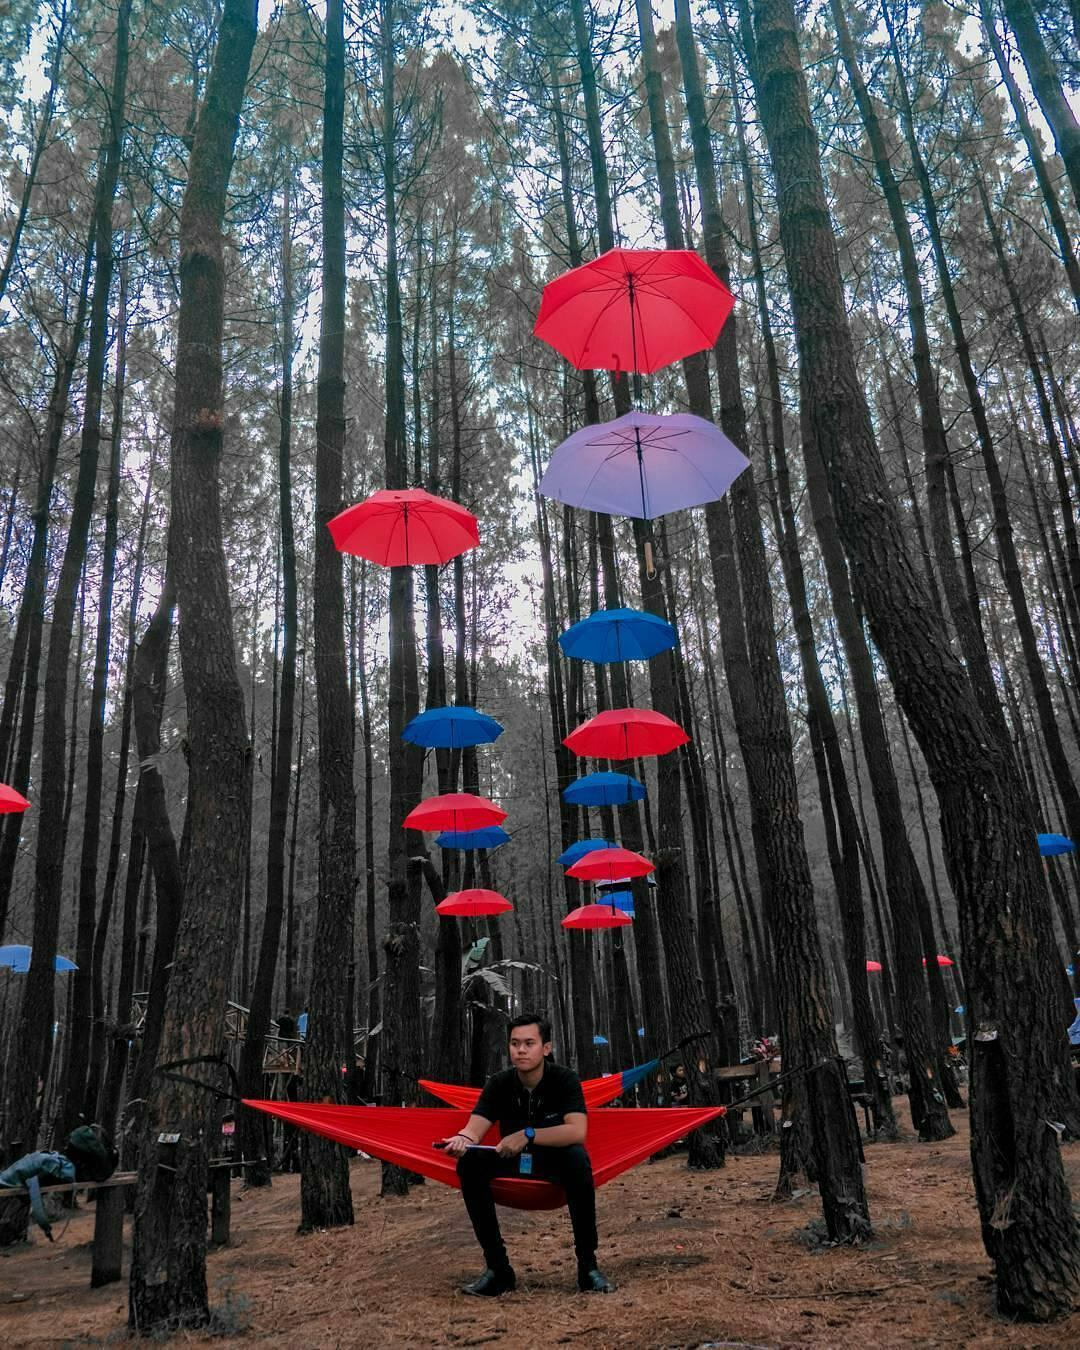 Hutan Pinus Semeru Malang, Malang, Malang Raya, Dolan Dolen, Dolaners Hutan Pinus Semeru by banganam78910 - Dolan Dolen